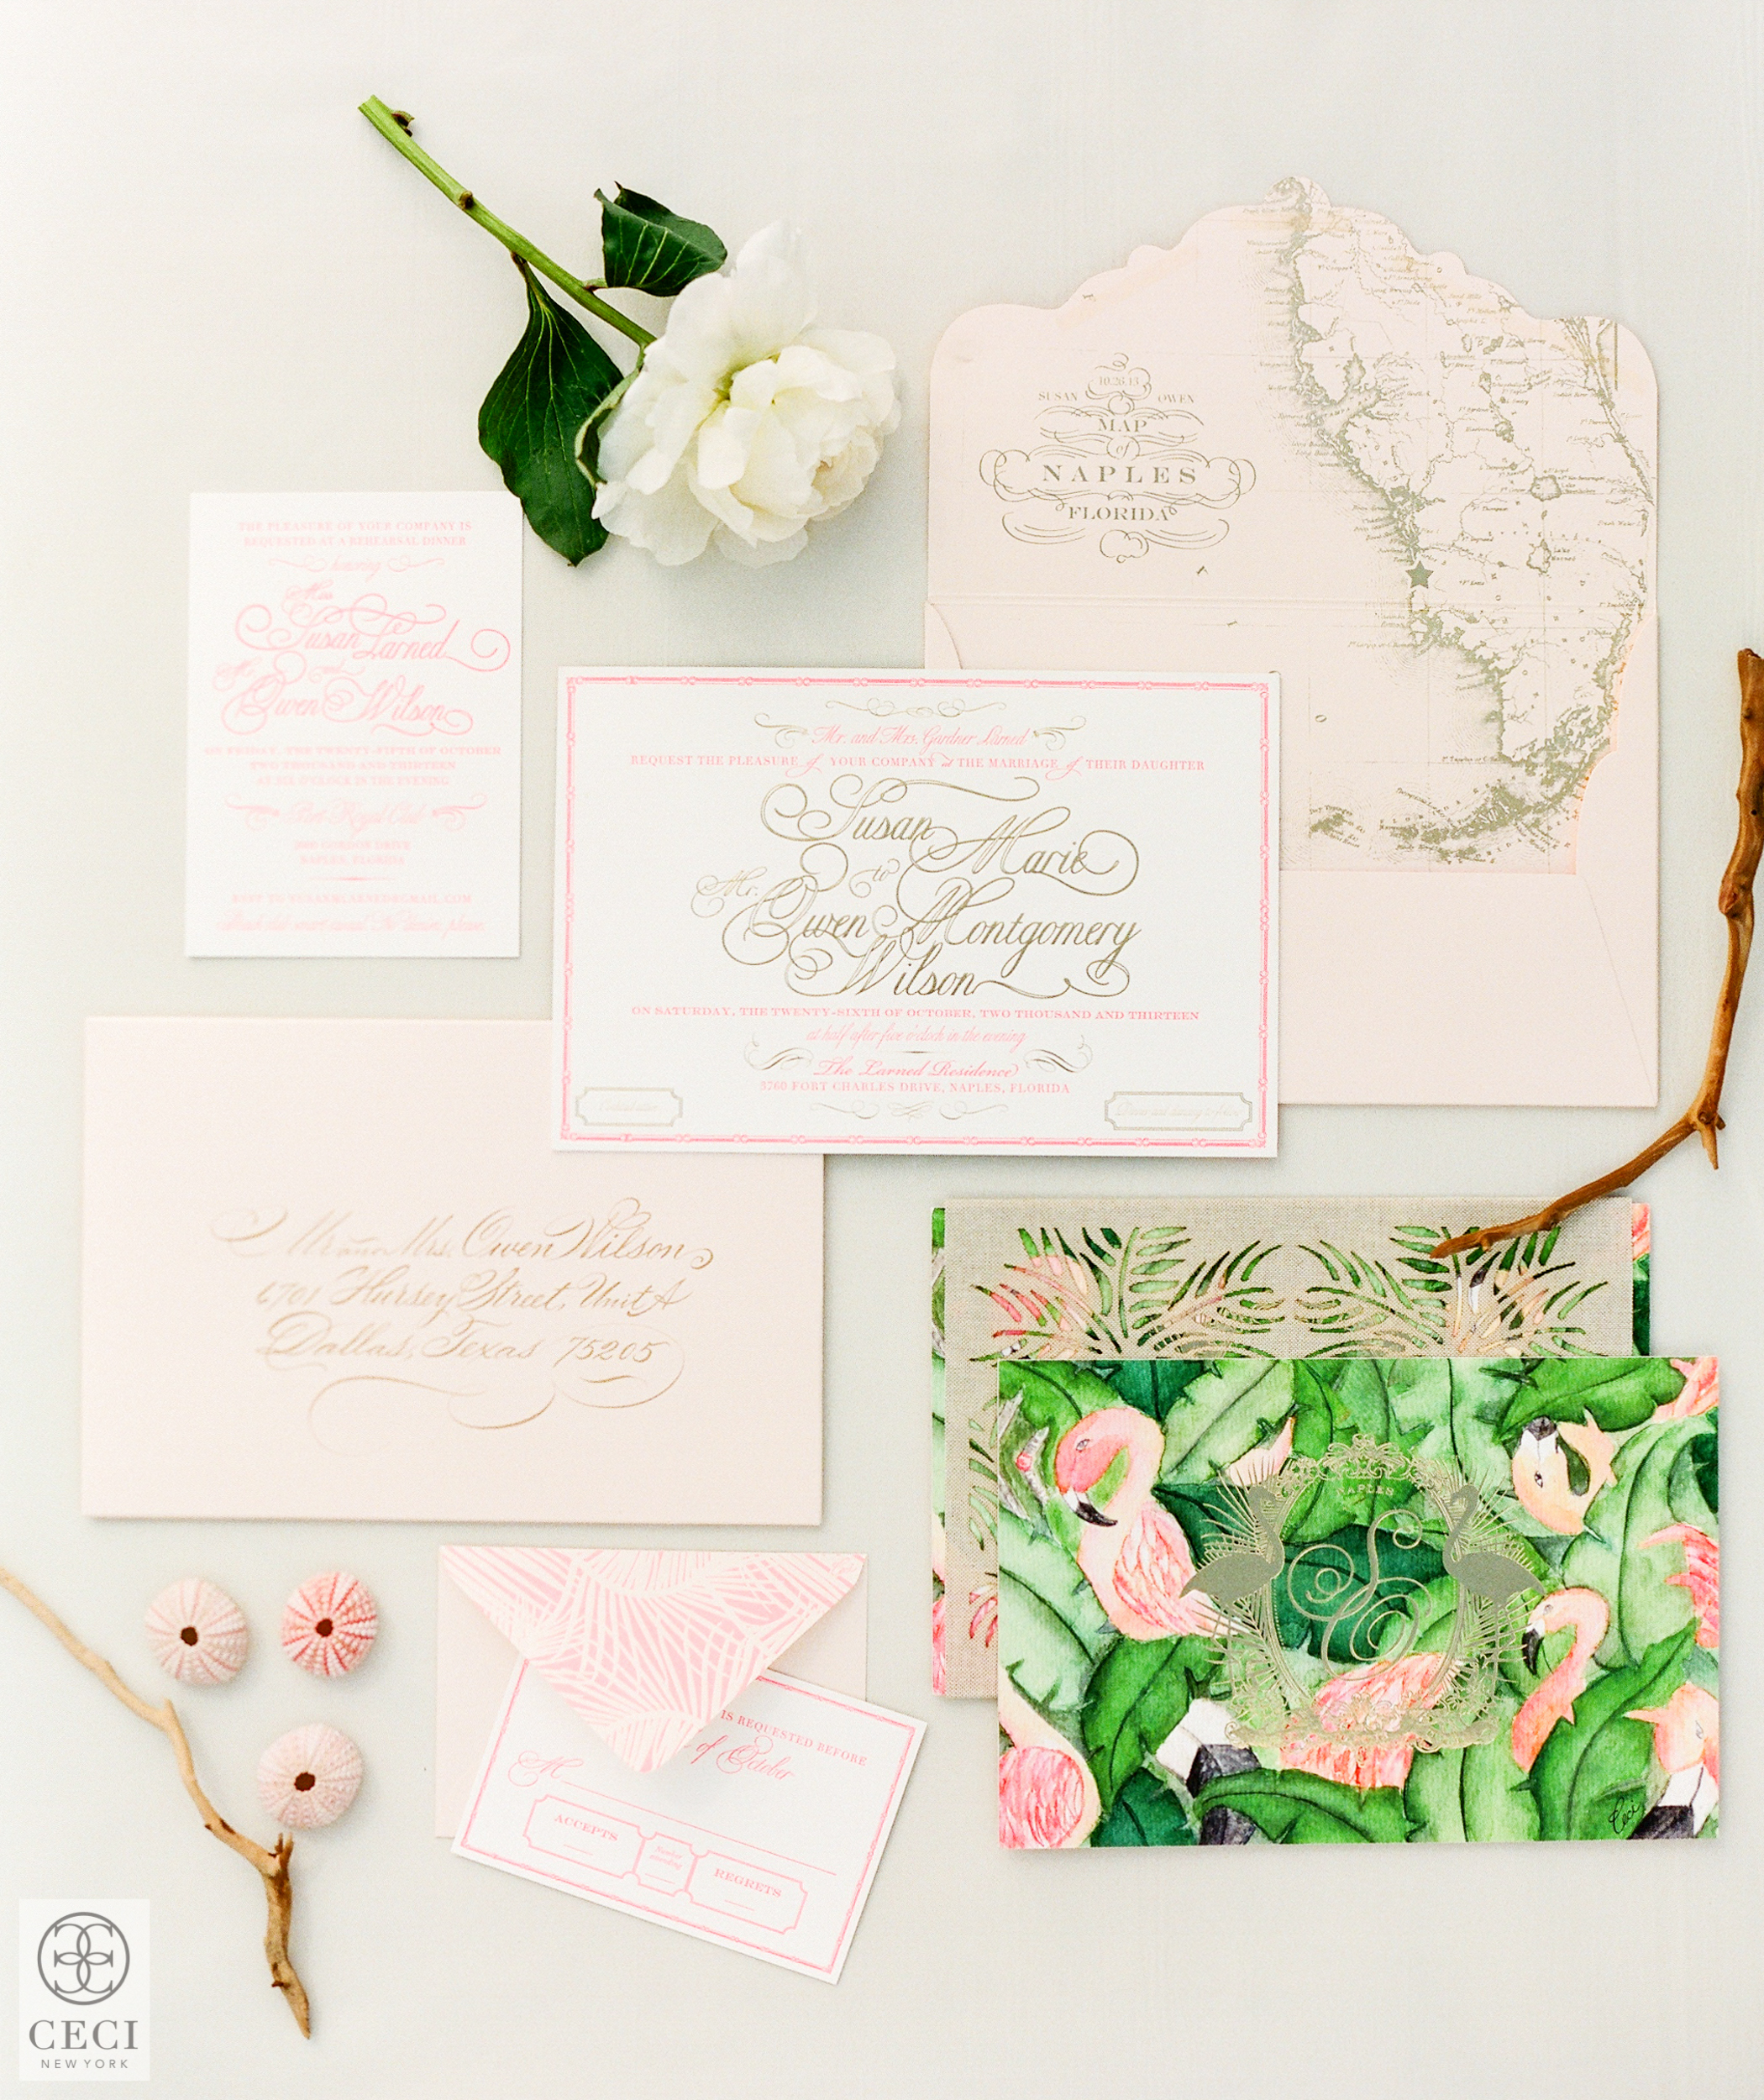 Ceci_New_York_Florida_Wedding_Style_Bride_Watercolor_Real_Custom_Luxury_21 Invite.jpg